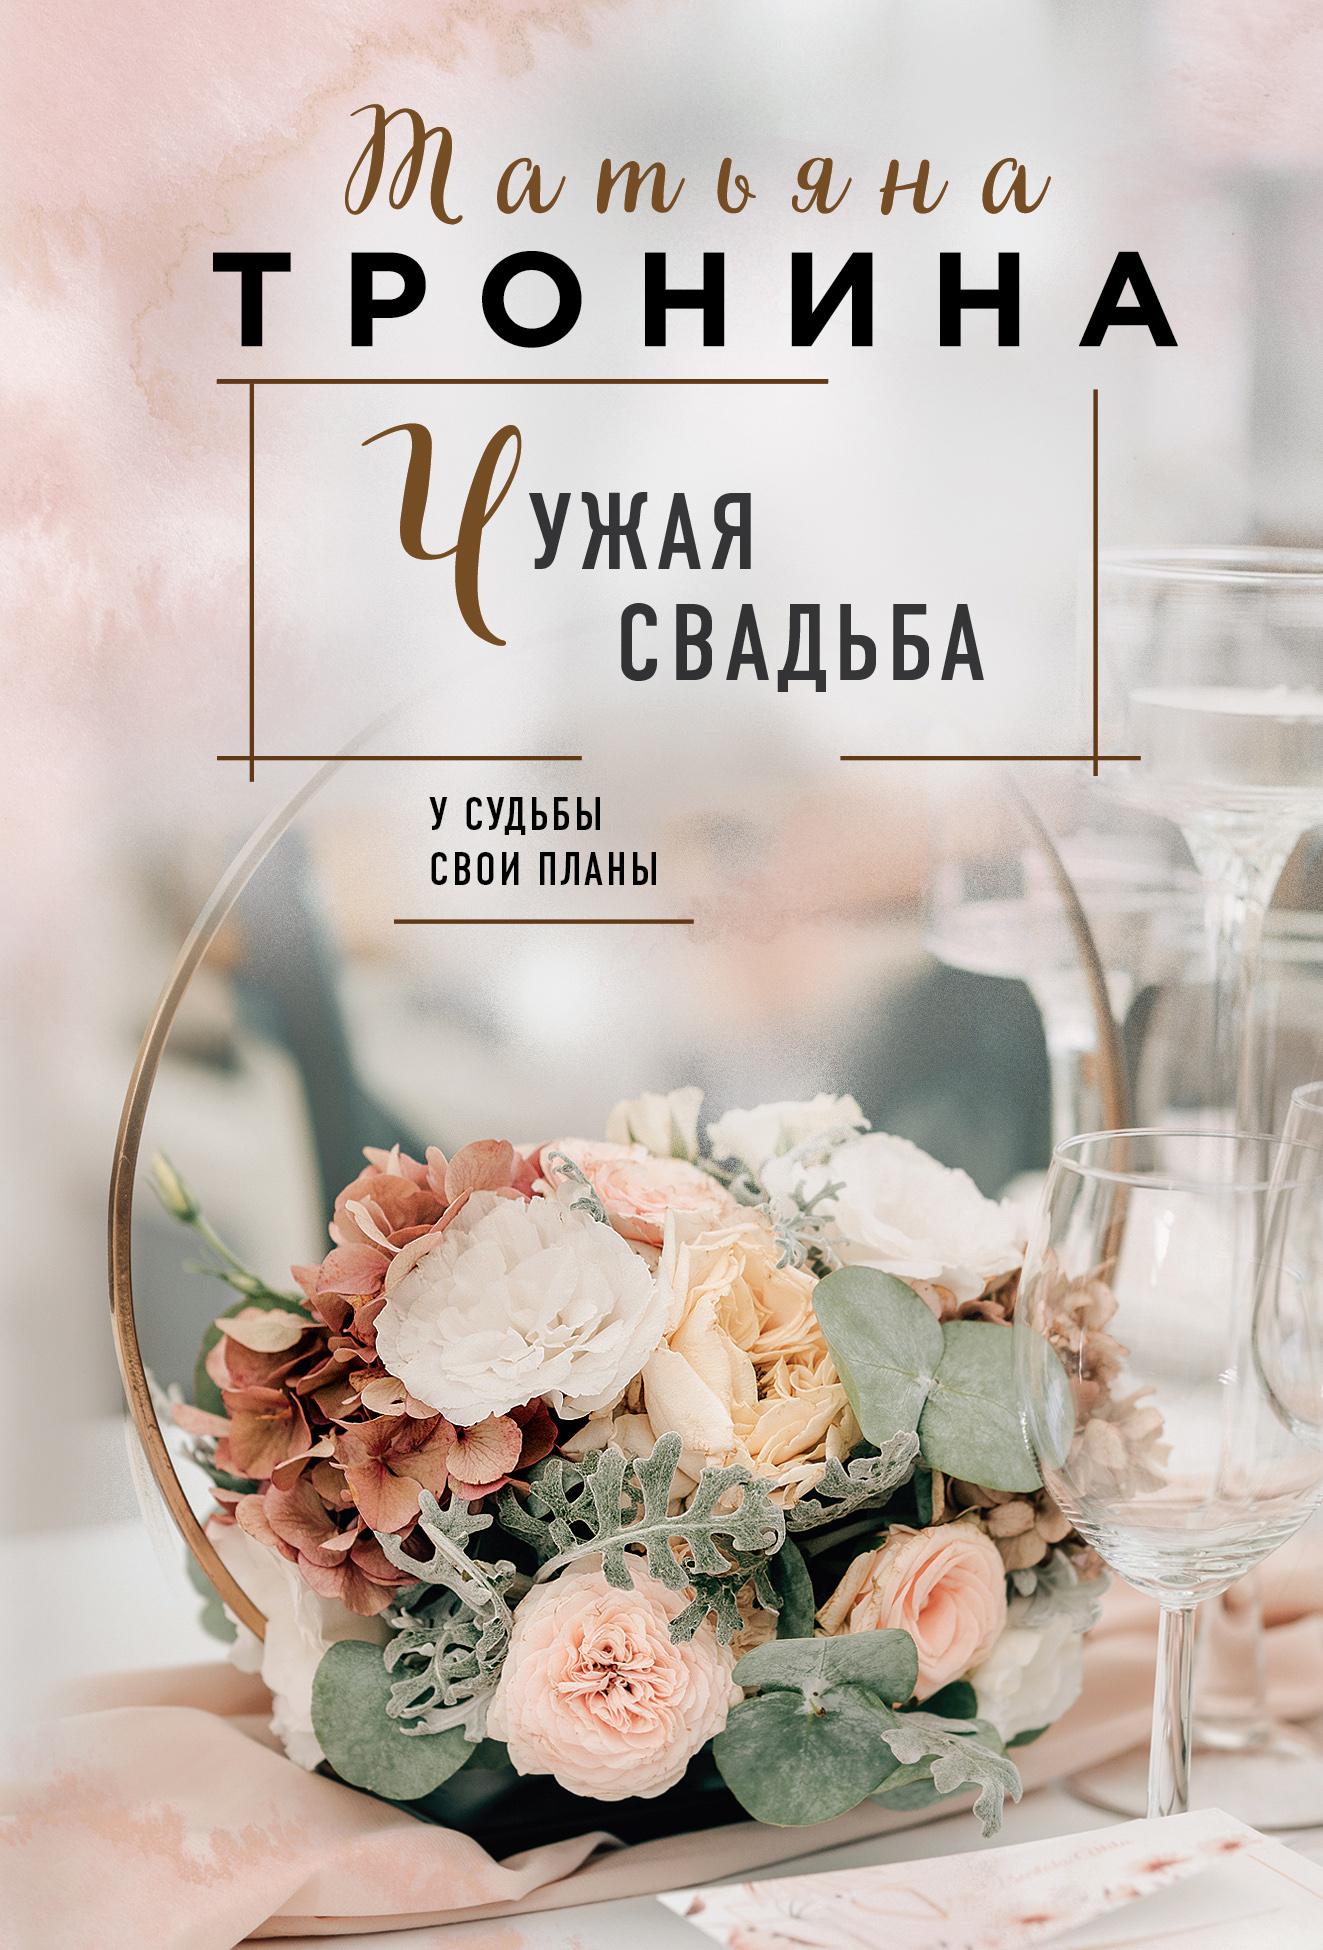 Татьяна Тронина Чужая свадьба цена 2017